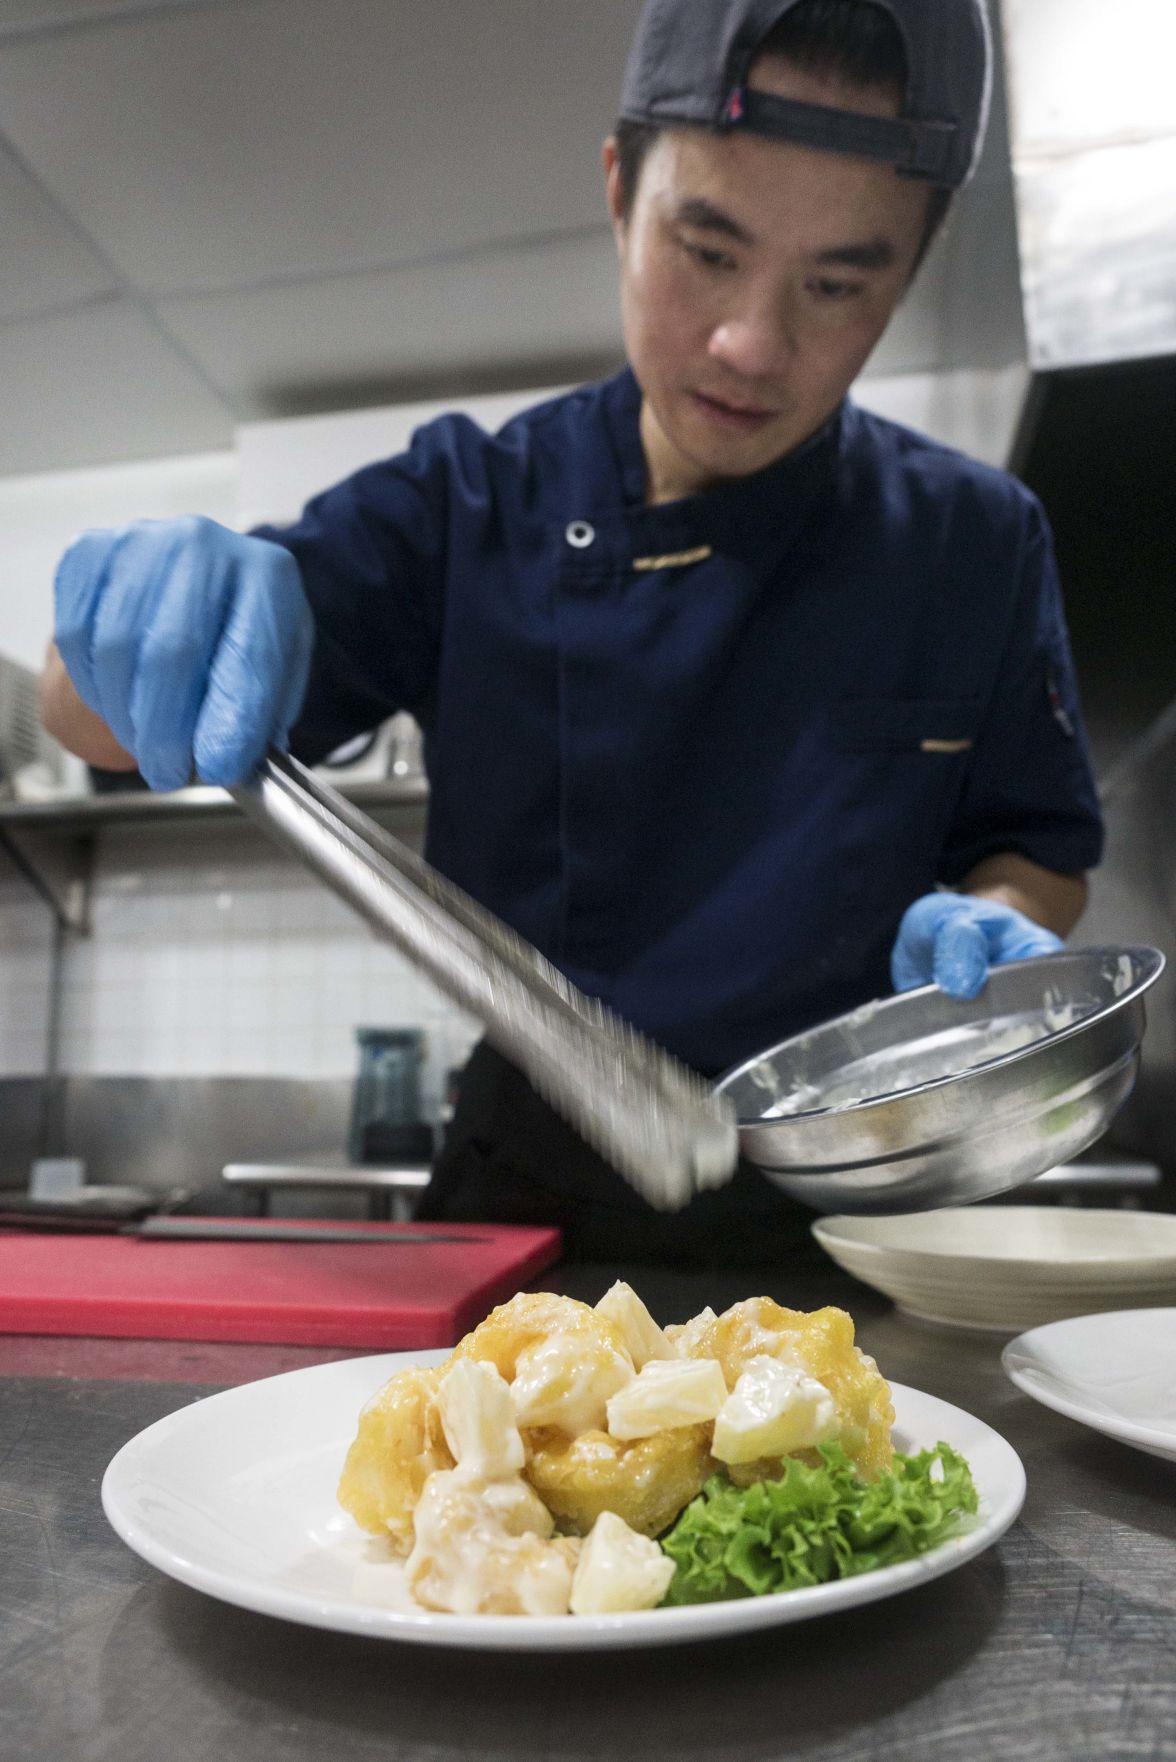 Guam's new Neighbor serves up international delights